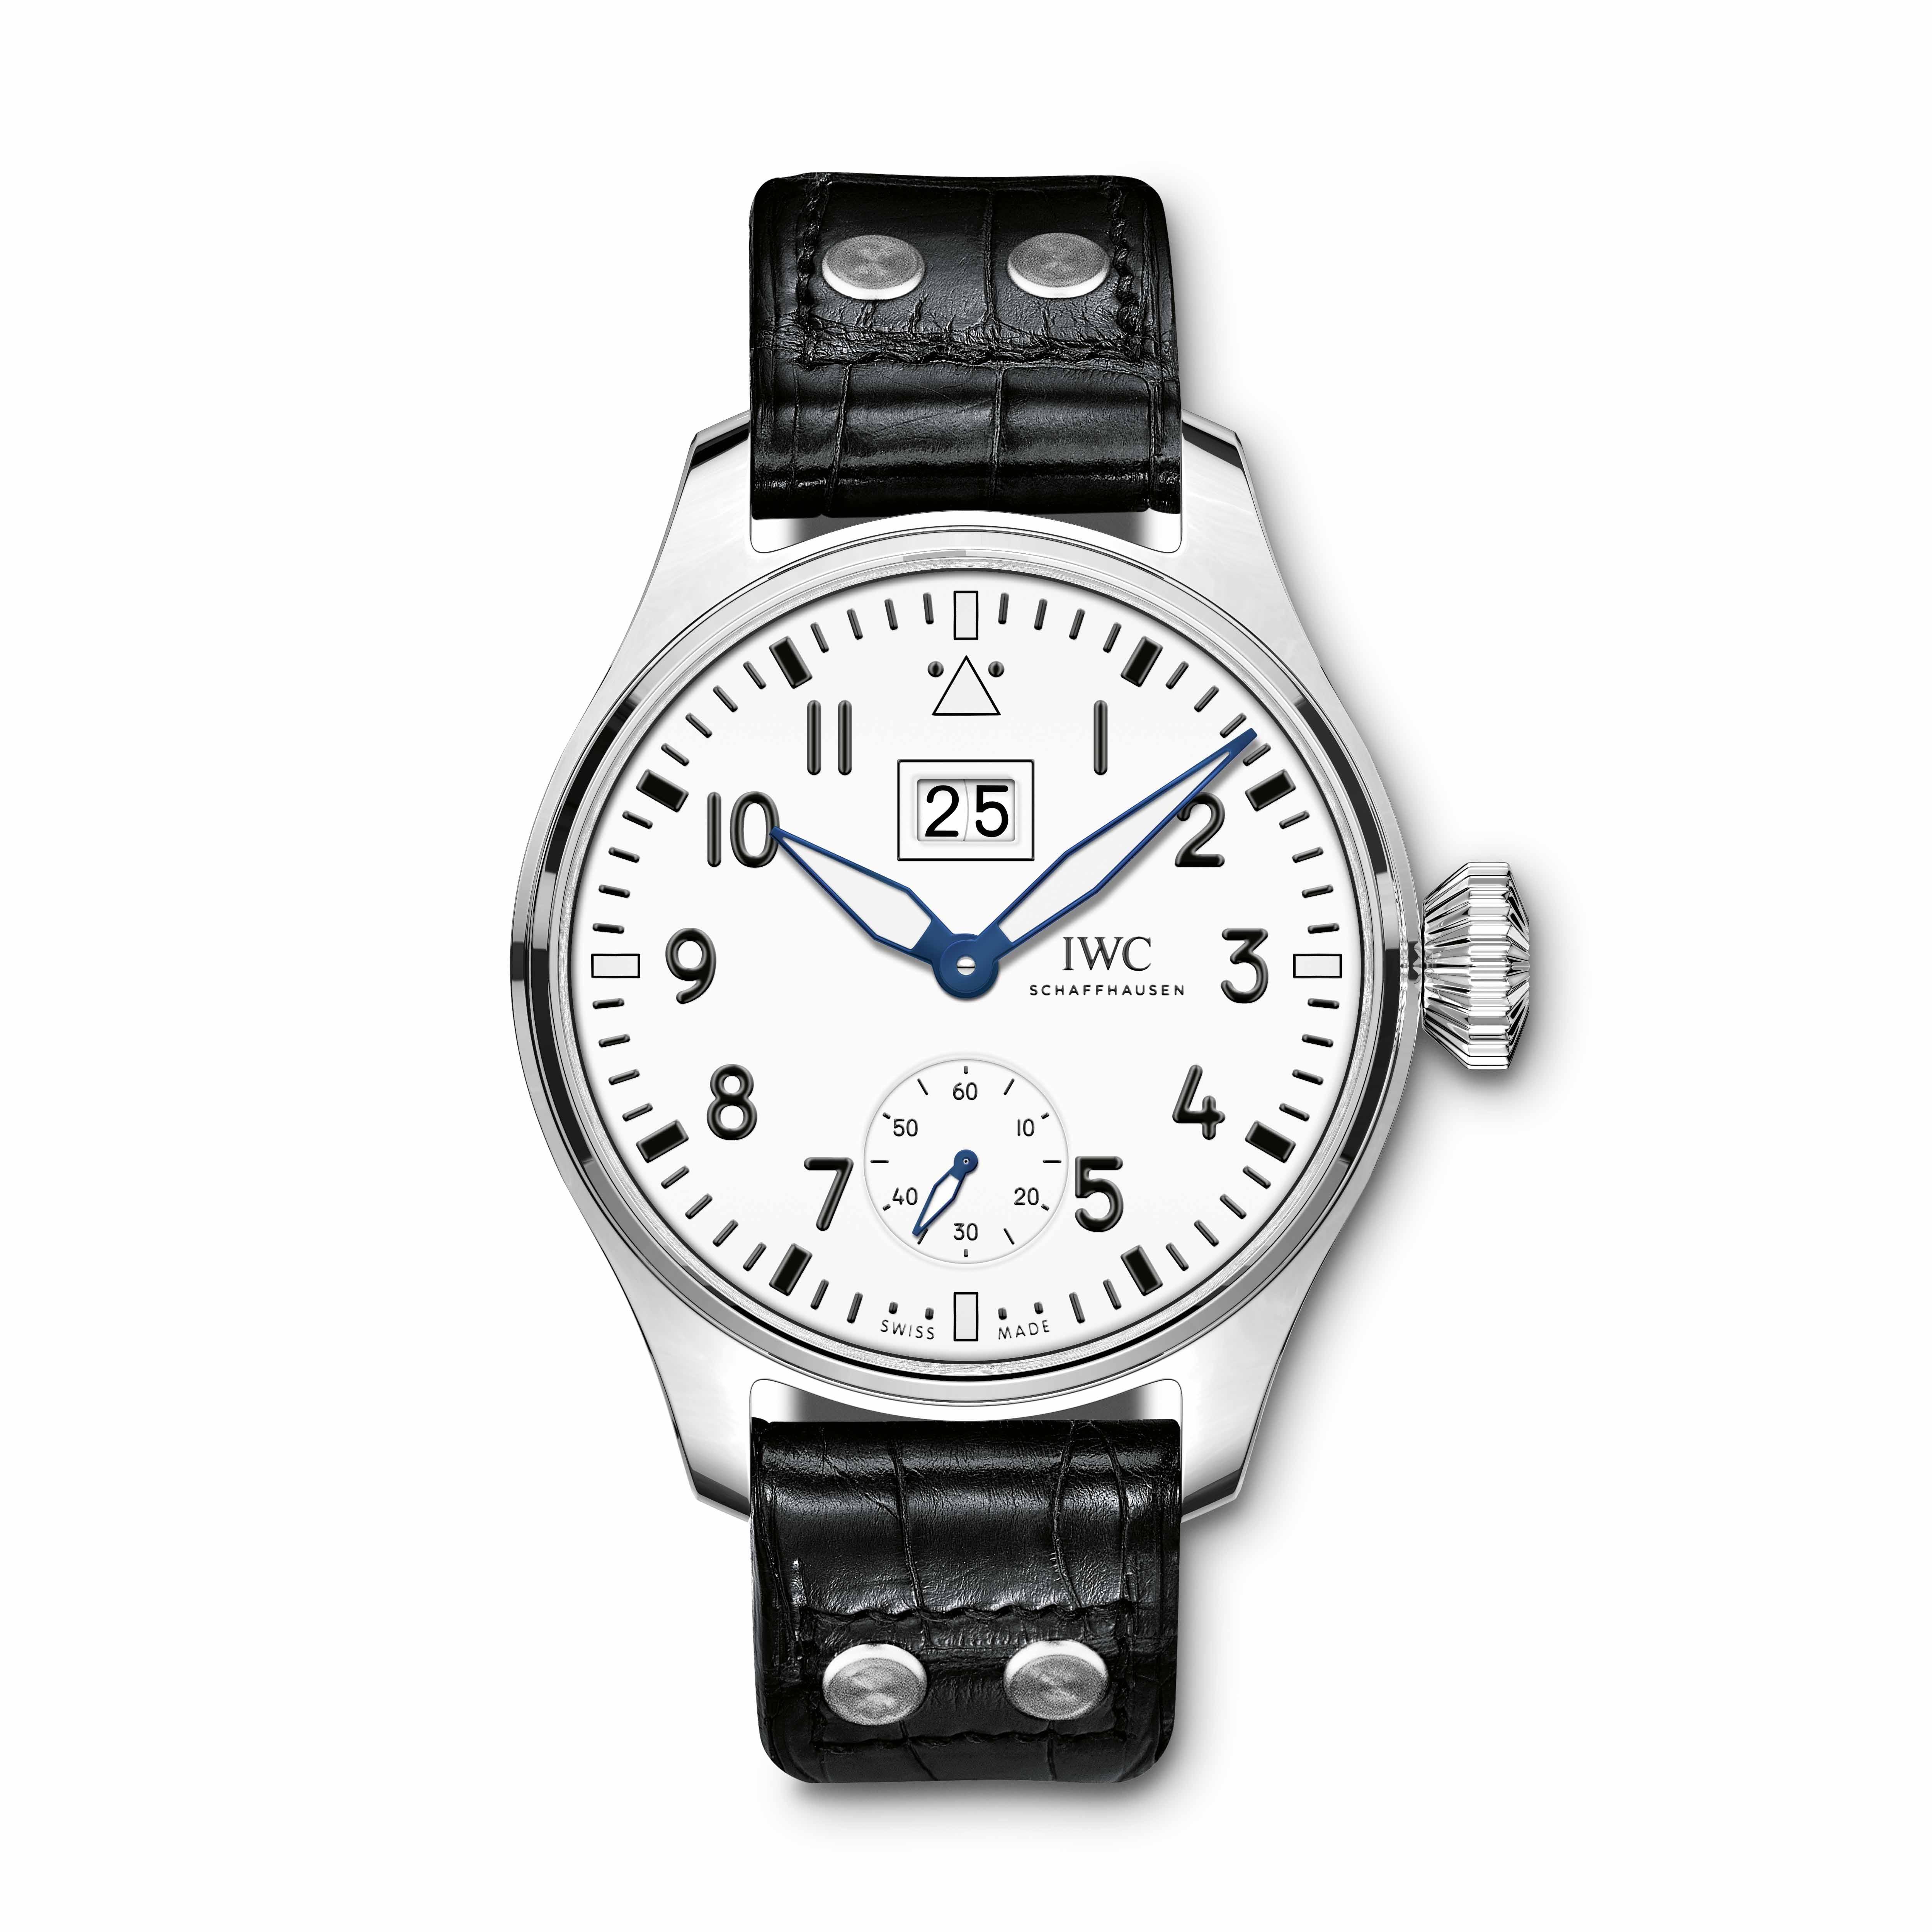 【SIHH2018】IWC万国表隆重推出漆面表盘飞行员腕表